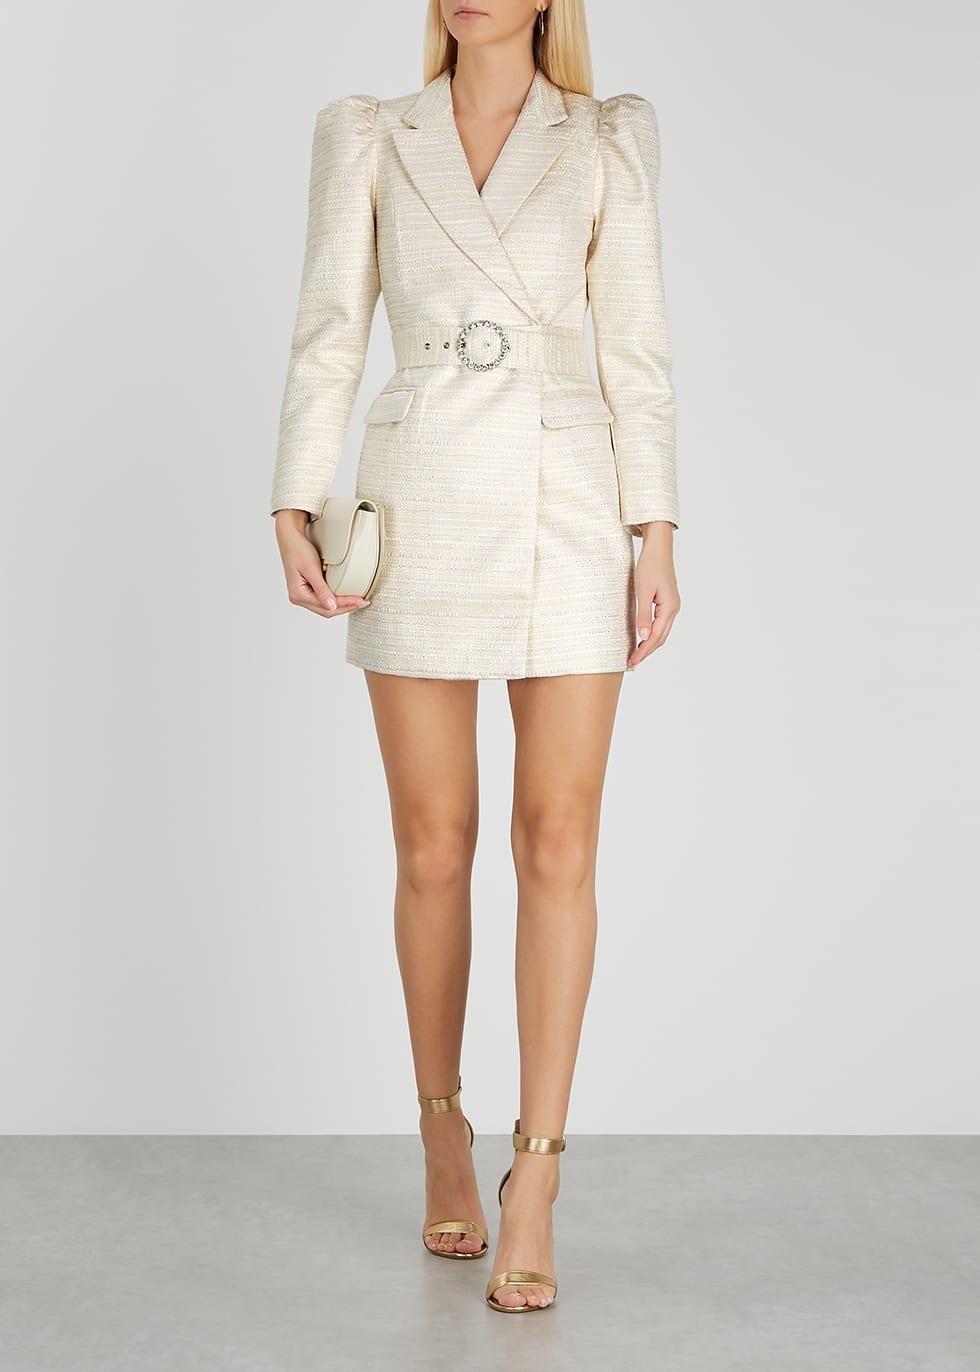 LAVISH ALICE Cream Bouclé Tweed Blazer Dress